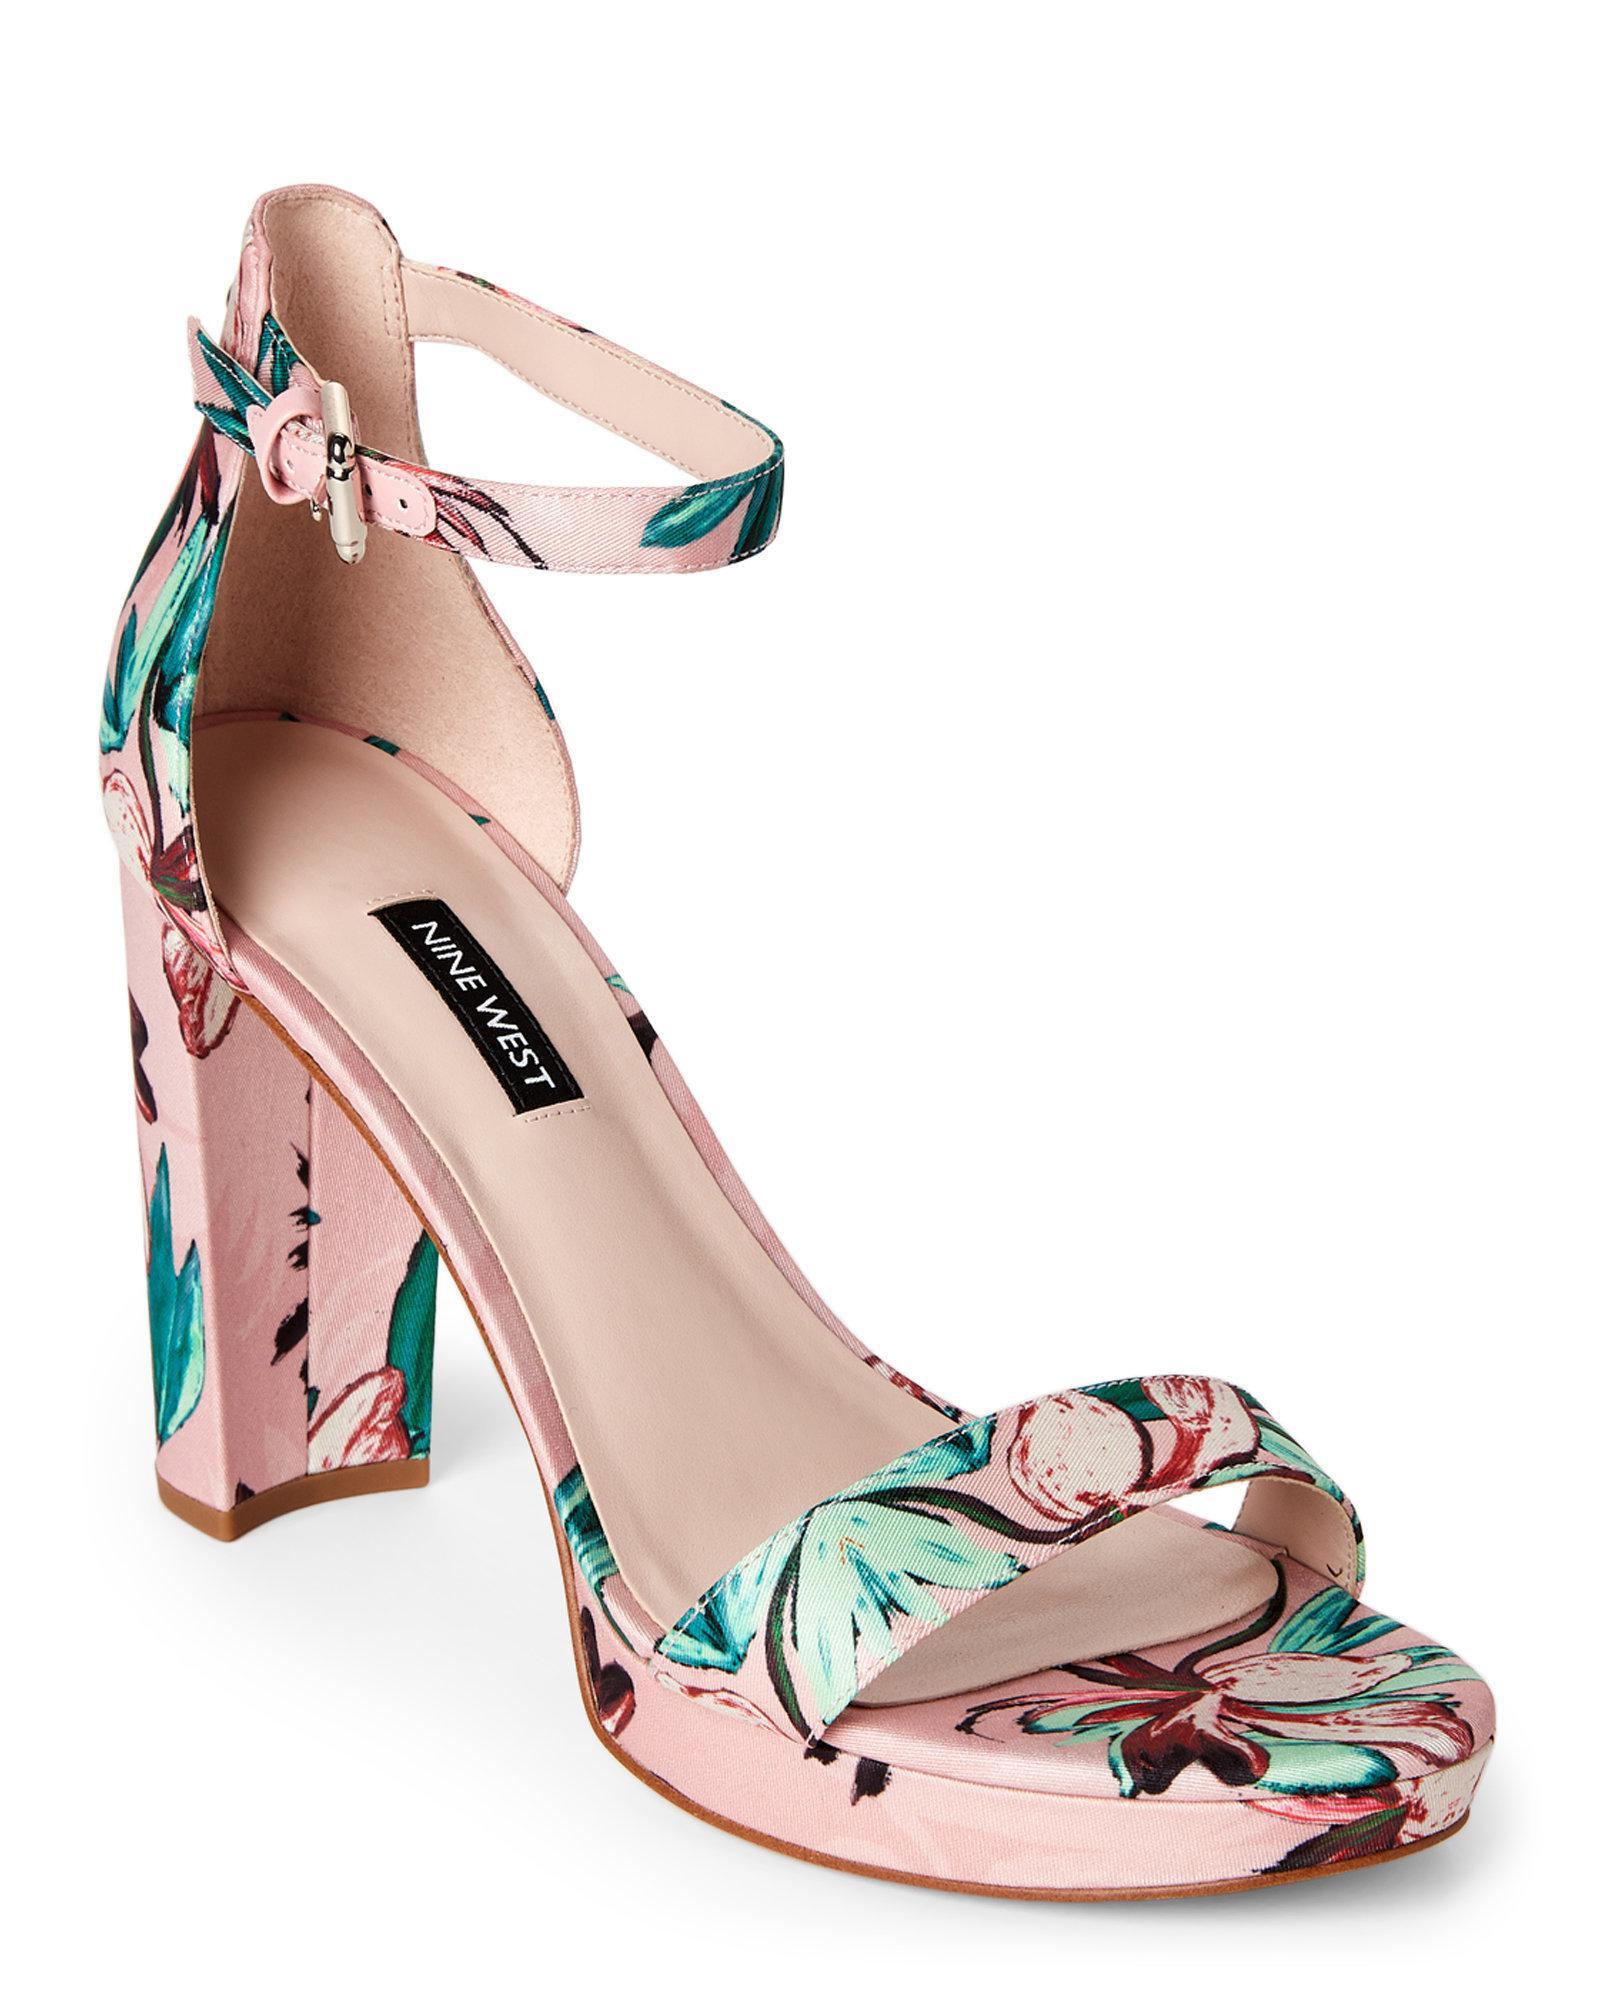 Lyst - Nine West Pink Dempsey Floral Satin Block Heel Sandals in Pink 68a674afaf85